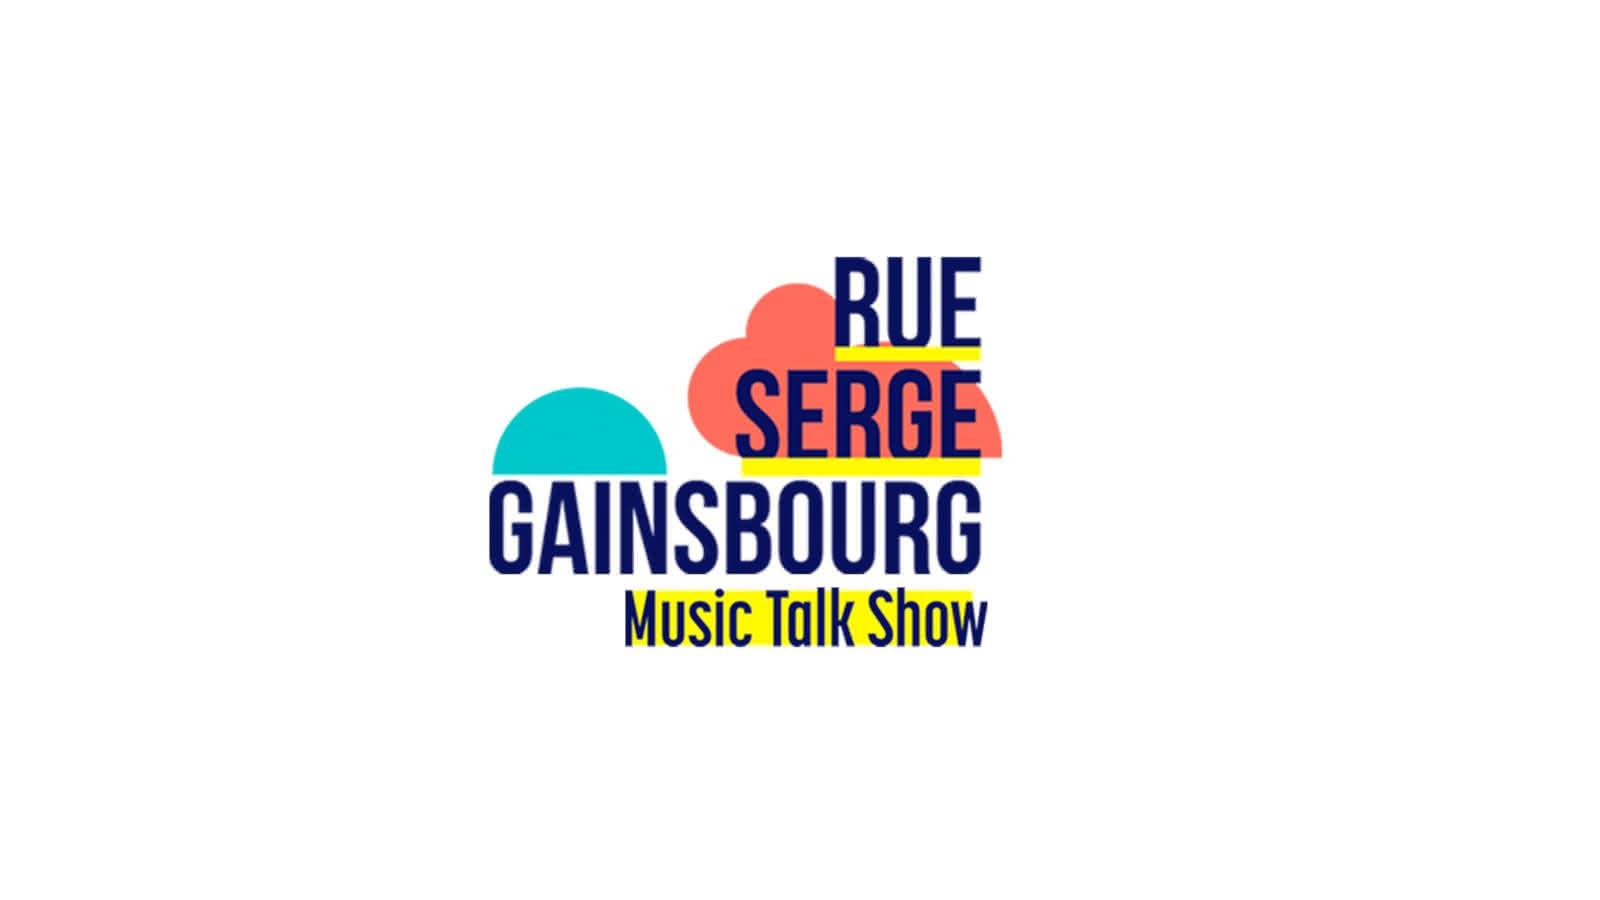 © Rue Serge Gainsbourg